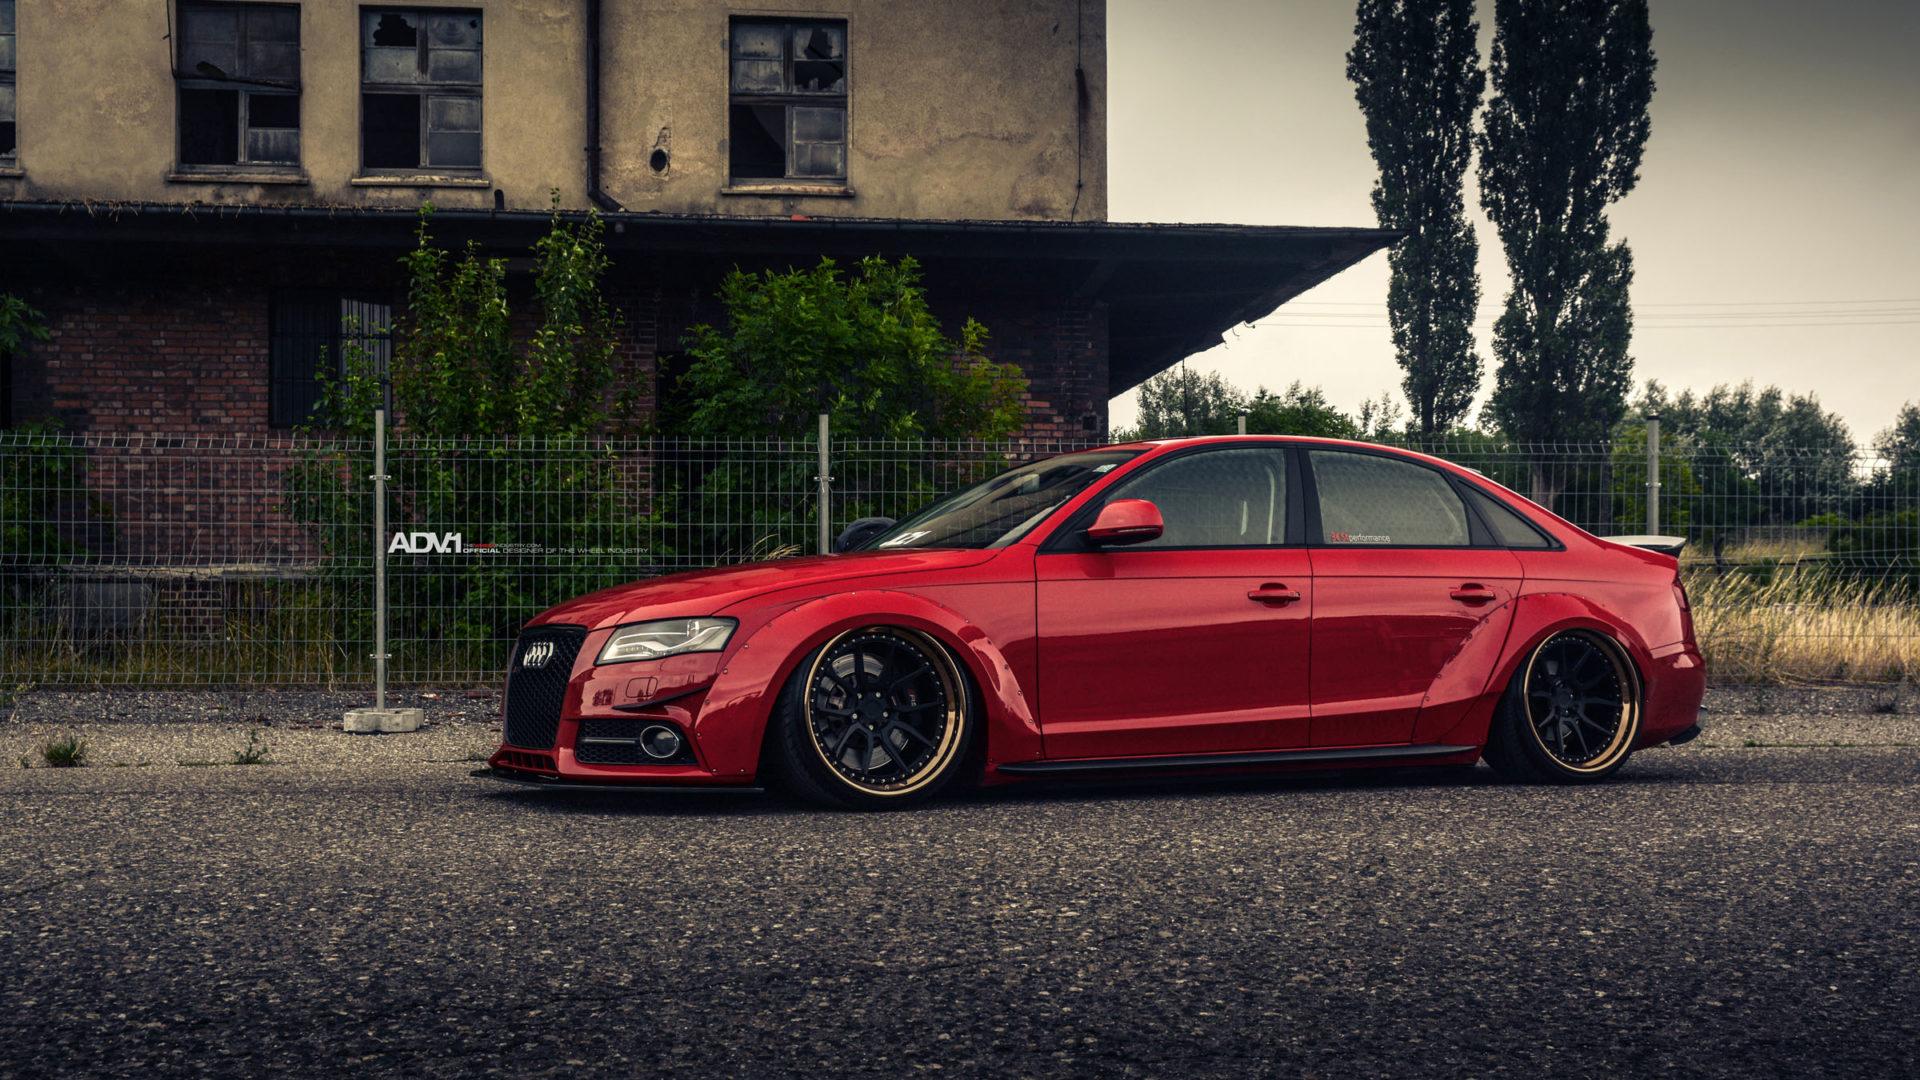 Audi Rs3 Wallpaper Hd Magical Gangsta Widebody Audi A4 Best Performance Adv